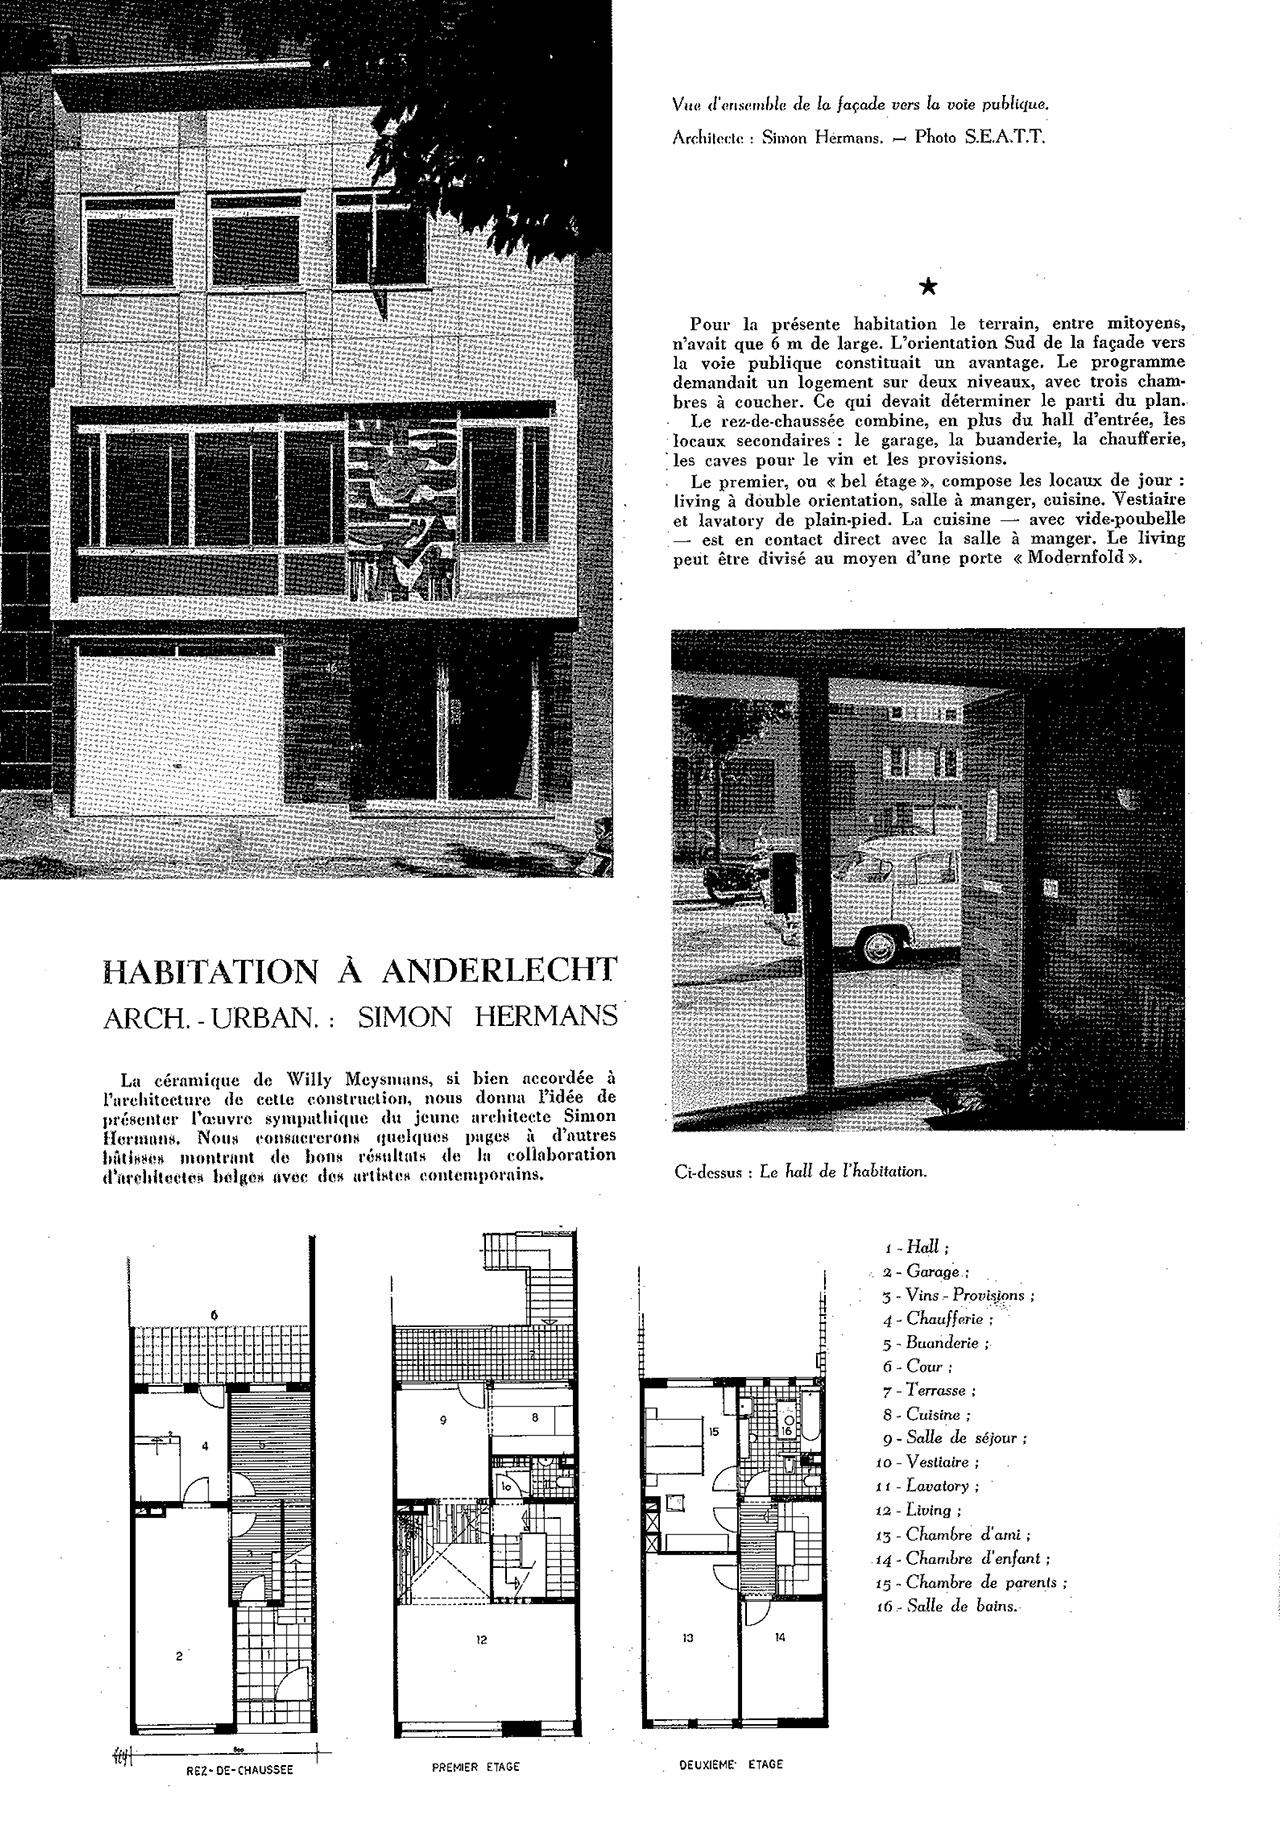 Habitation à Anderlecht